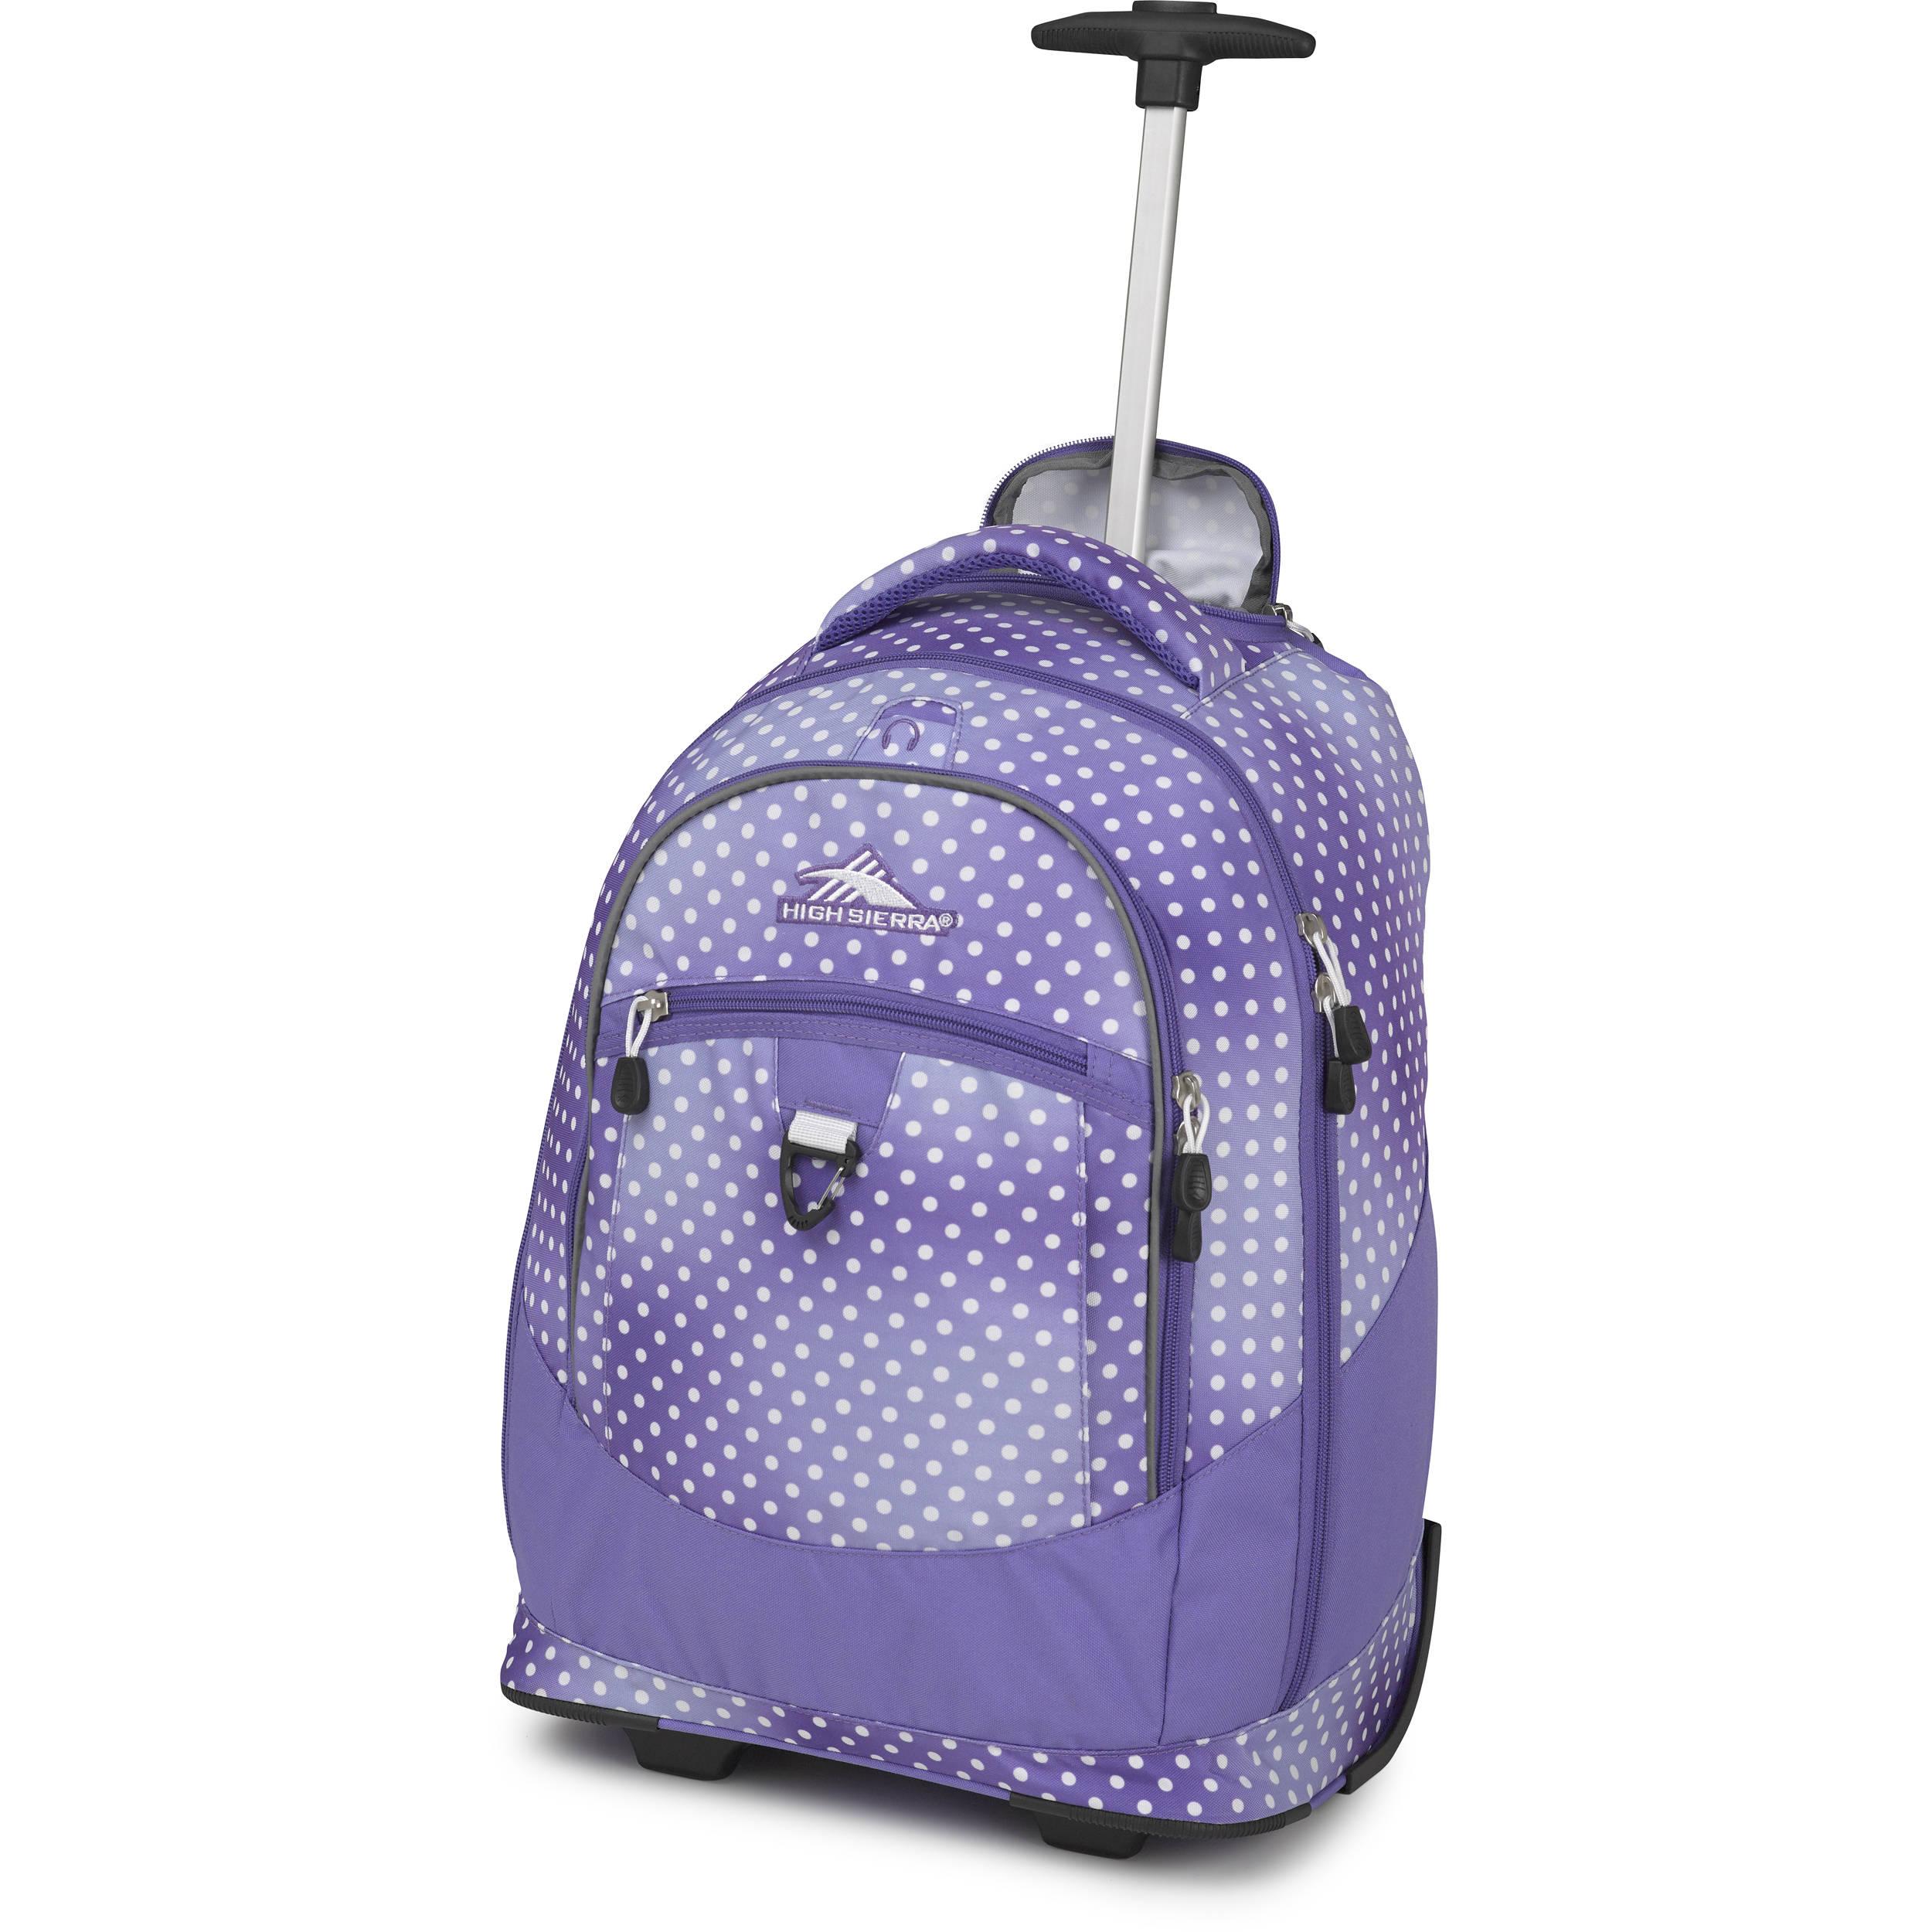 High Sierra Chaser Wheeled Backpack Sprinkle Dots Lavender